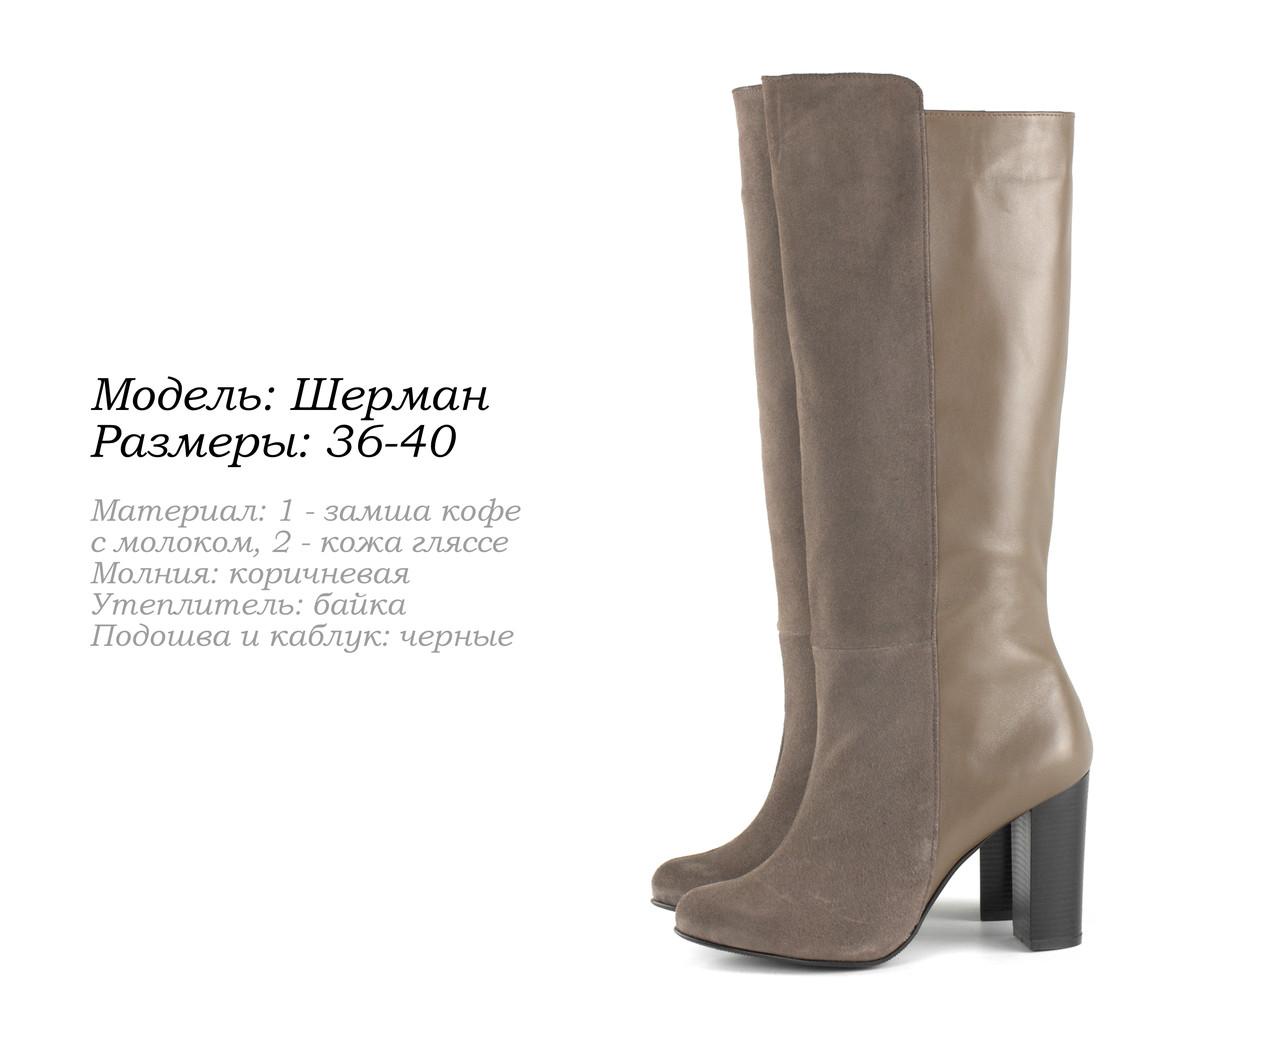 bc2f4d7e9 Сапоги кожаные на ровном каблуке.: продажа, цена в Днепре. сапоги ...